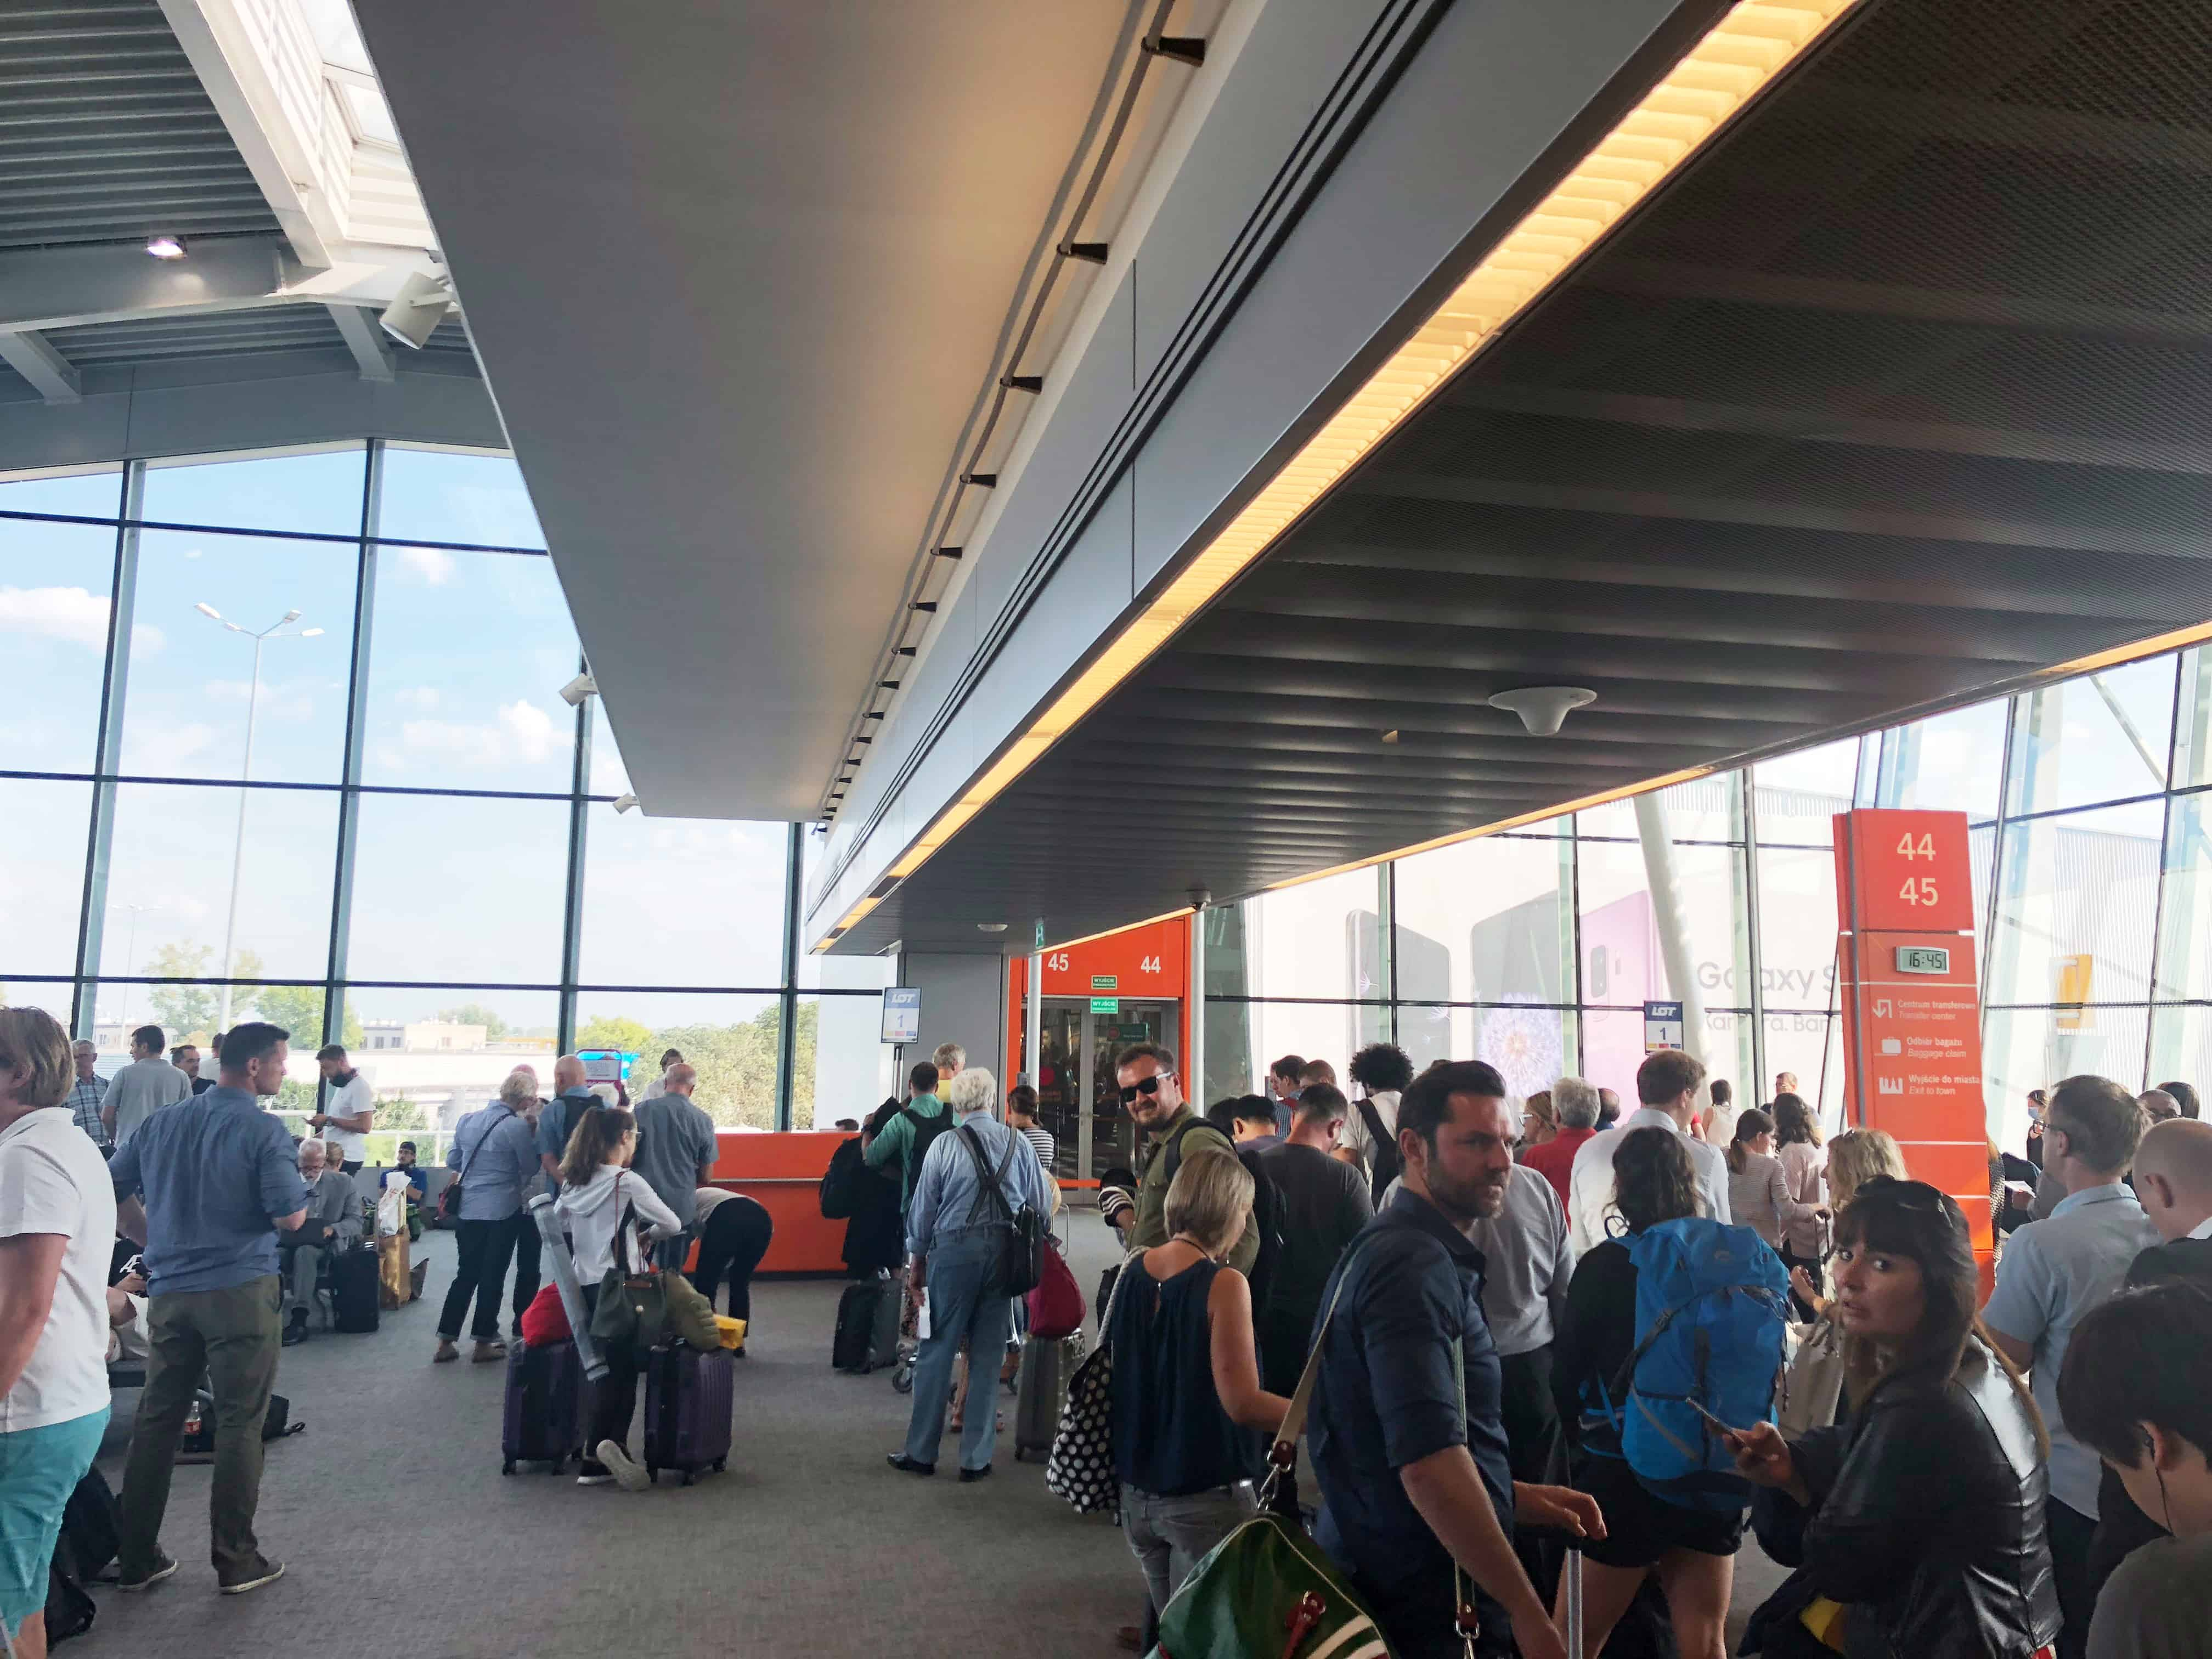 LOT Bewertung Boarding München